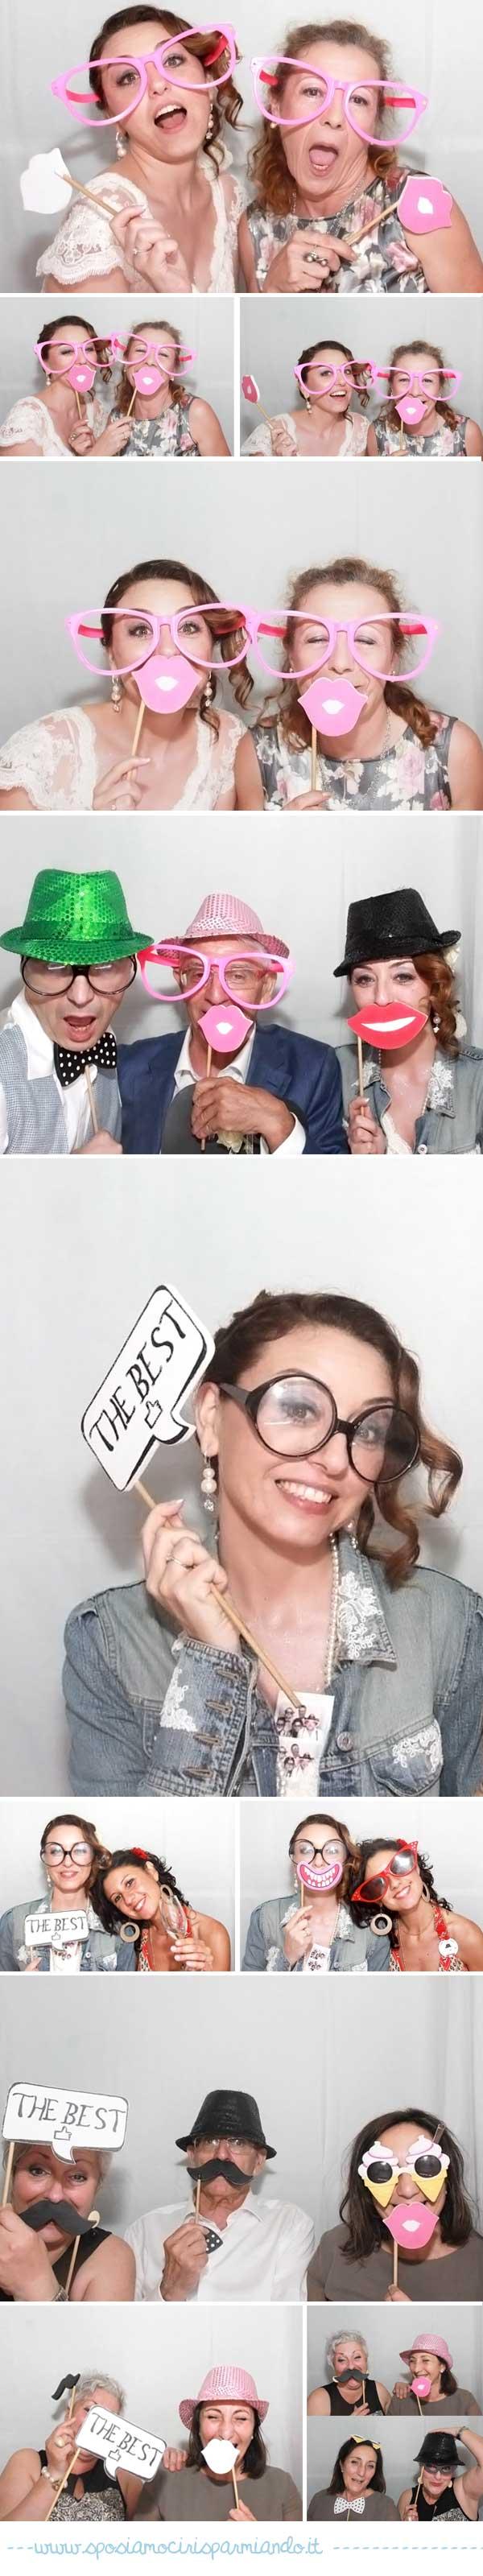 strip cabina photo booth matrimonio